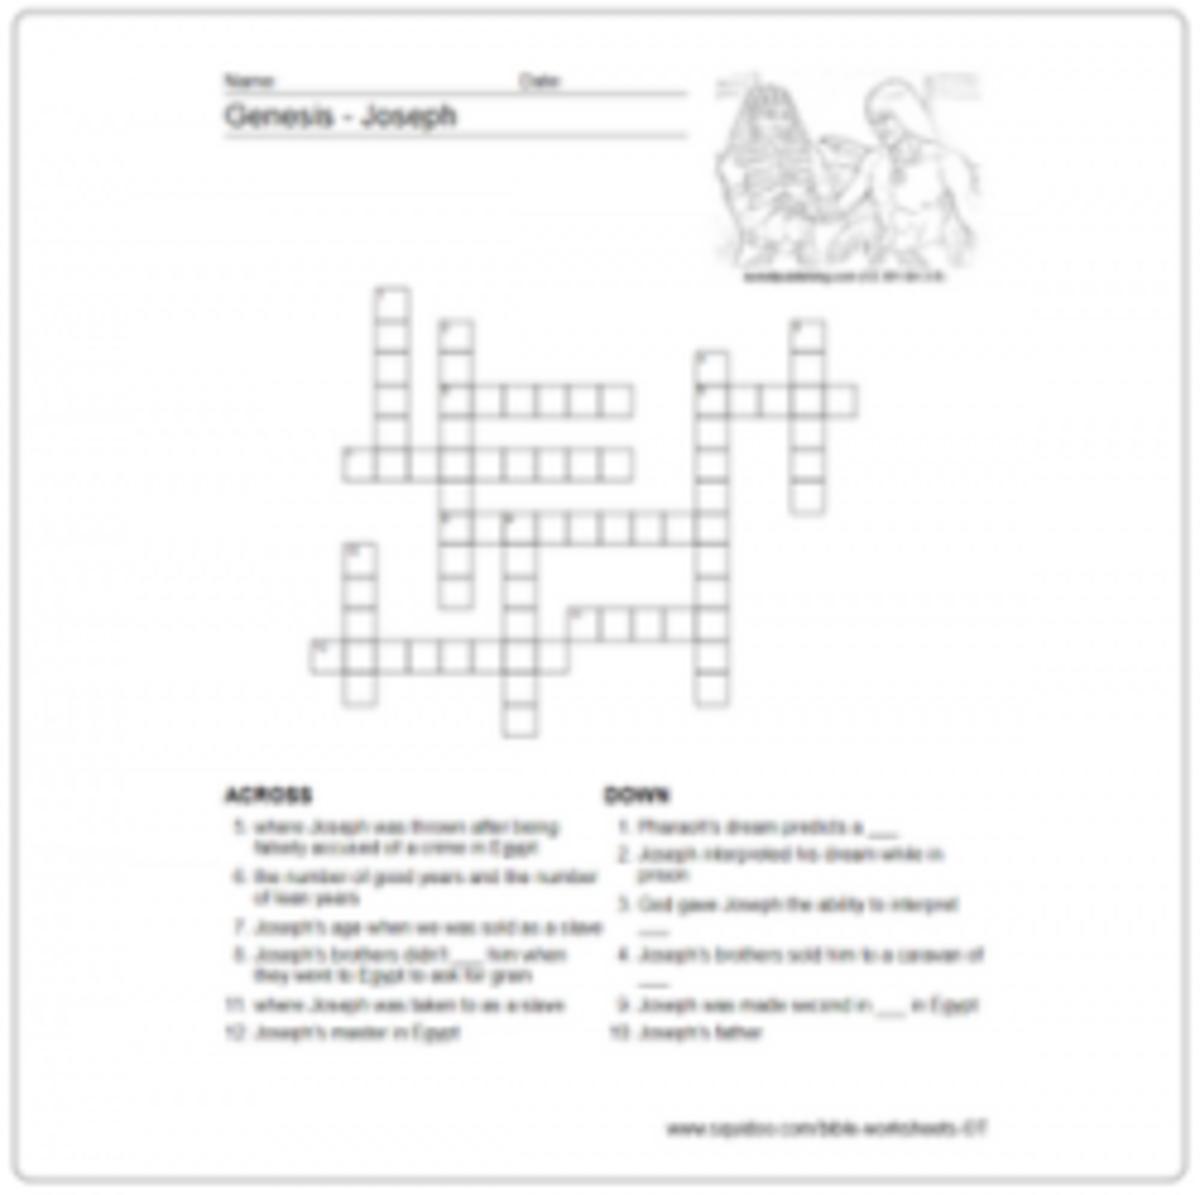 Dictionary Practice Worksheet Excel Genesis Worksheets  Hubpages Ratio Worksheet 7th Grade Word with Free Reading Comprehension Worksheets For Middle School  Sphere Volume Worksheet Pdf